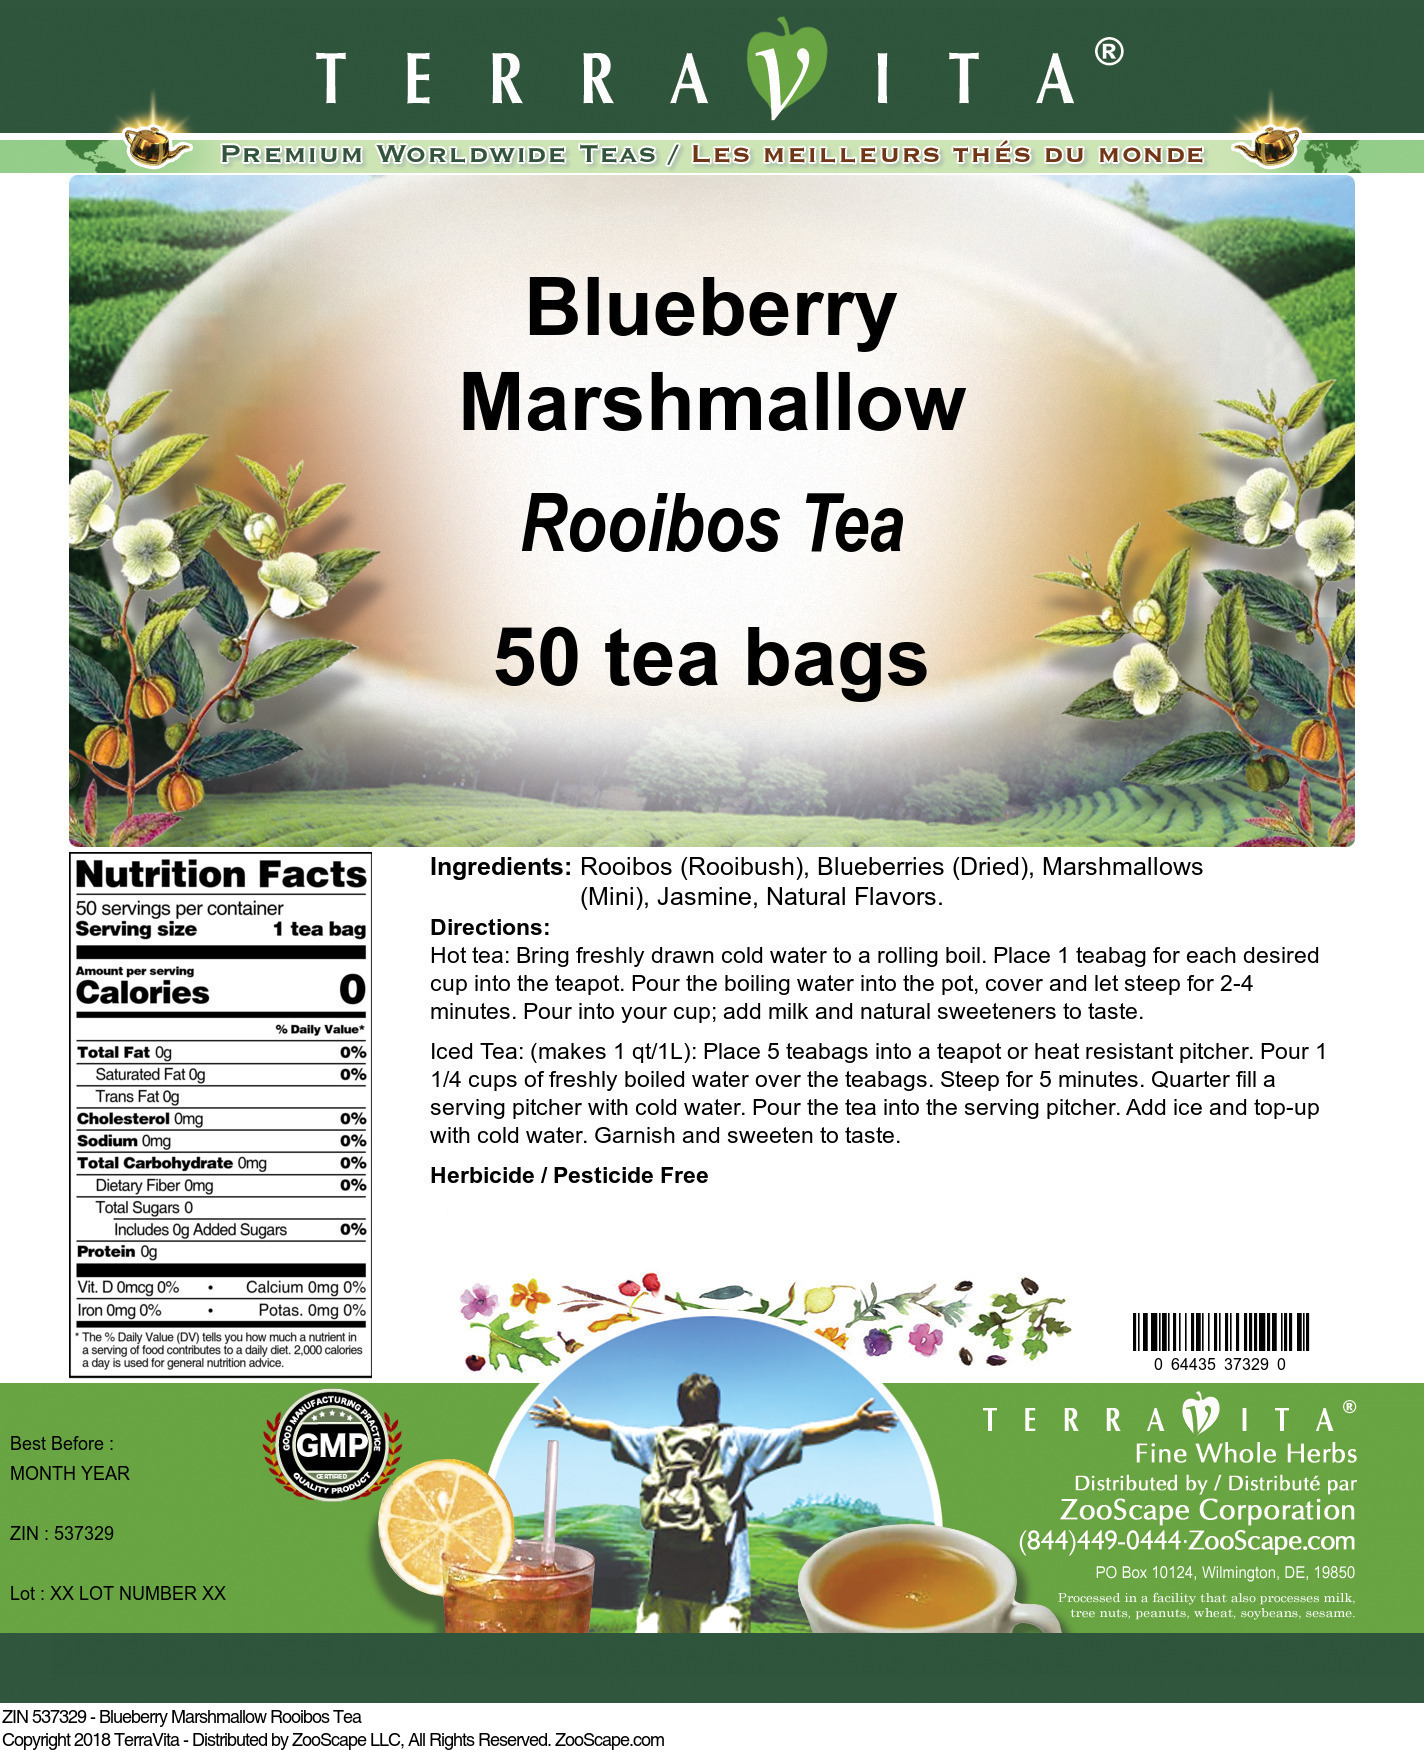 Blueberry Marshmallow Rooibos Tea